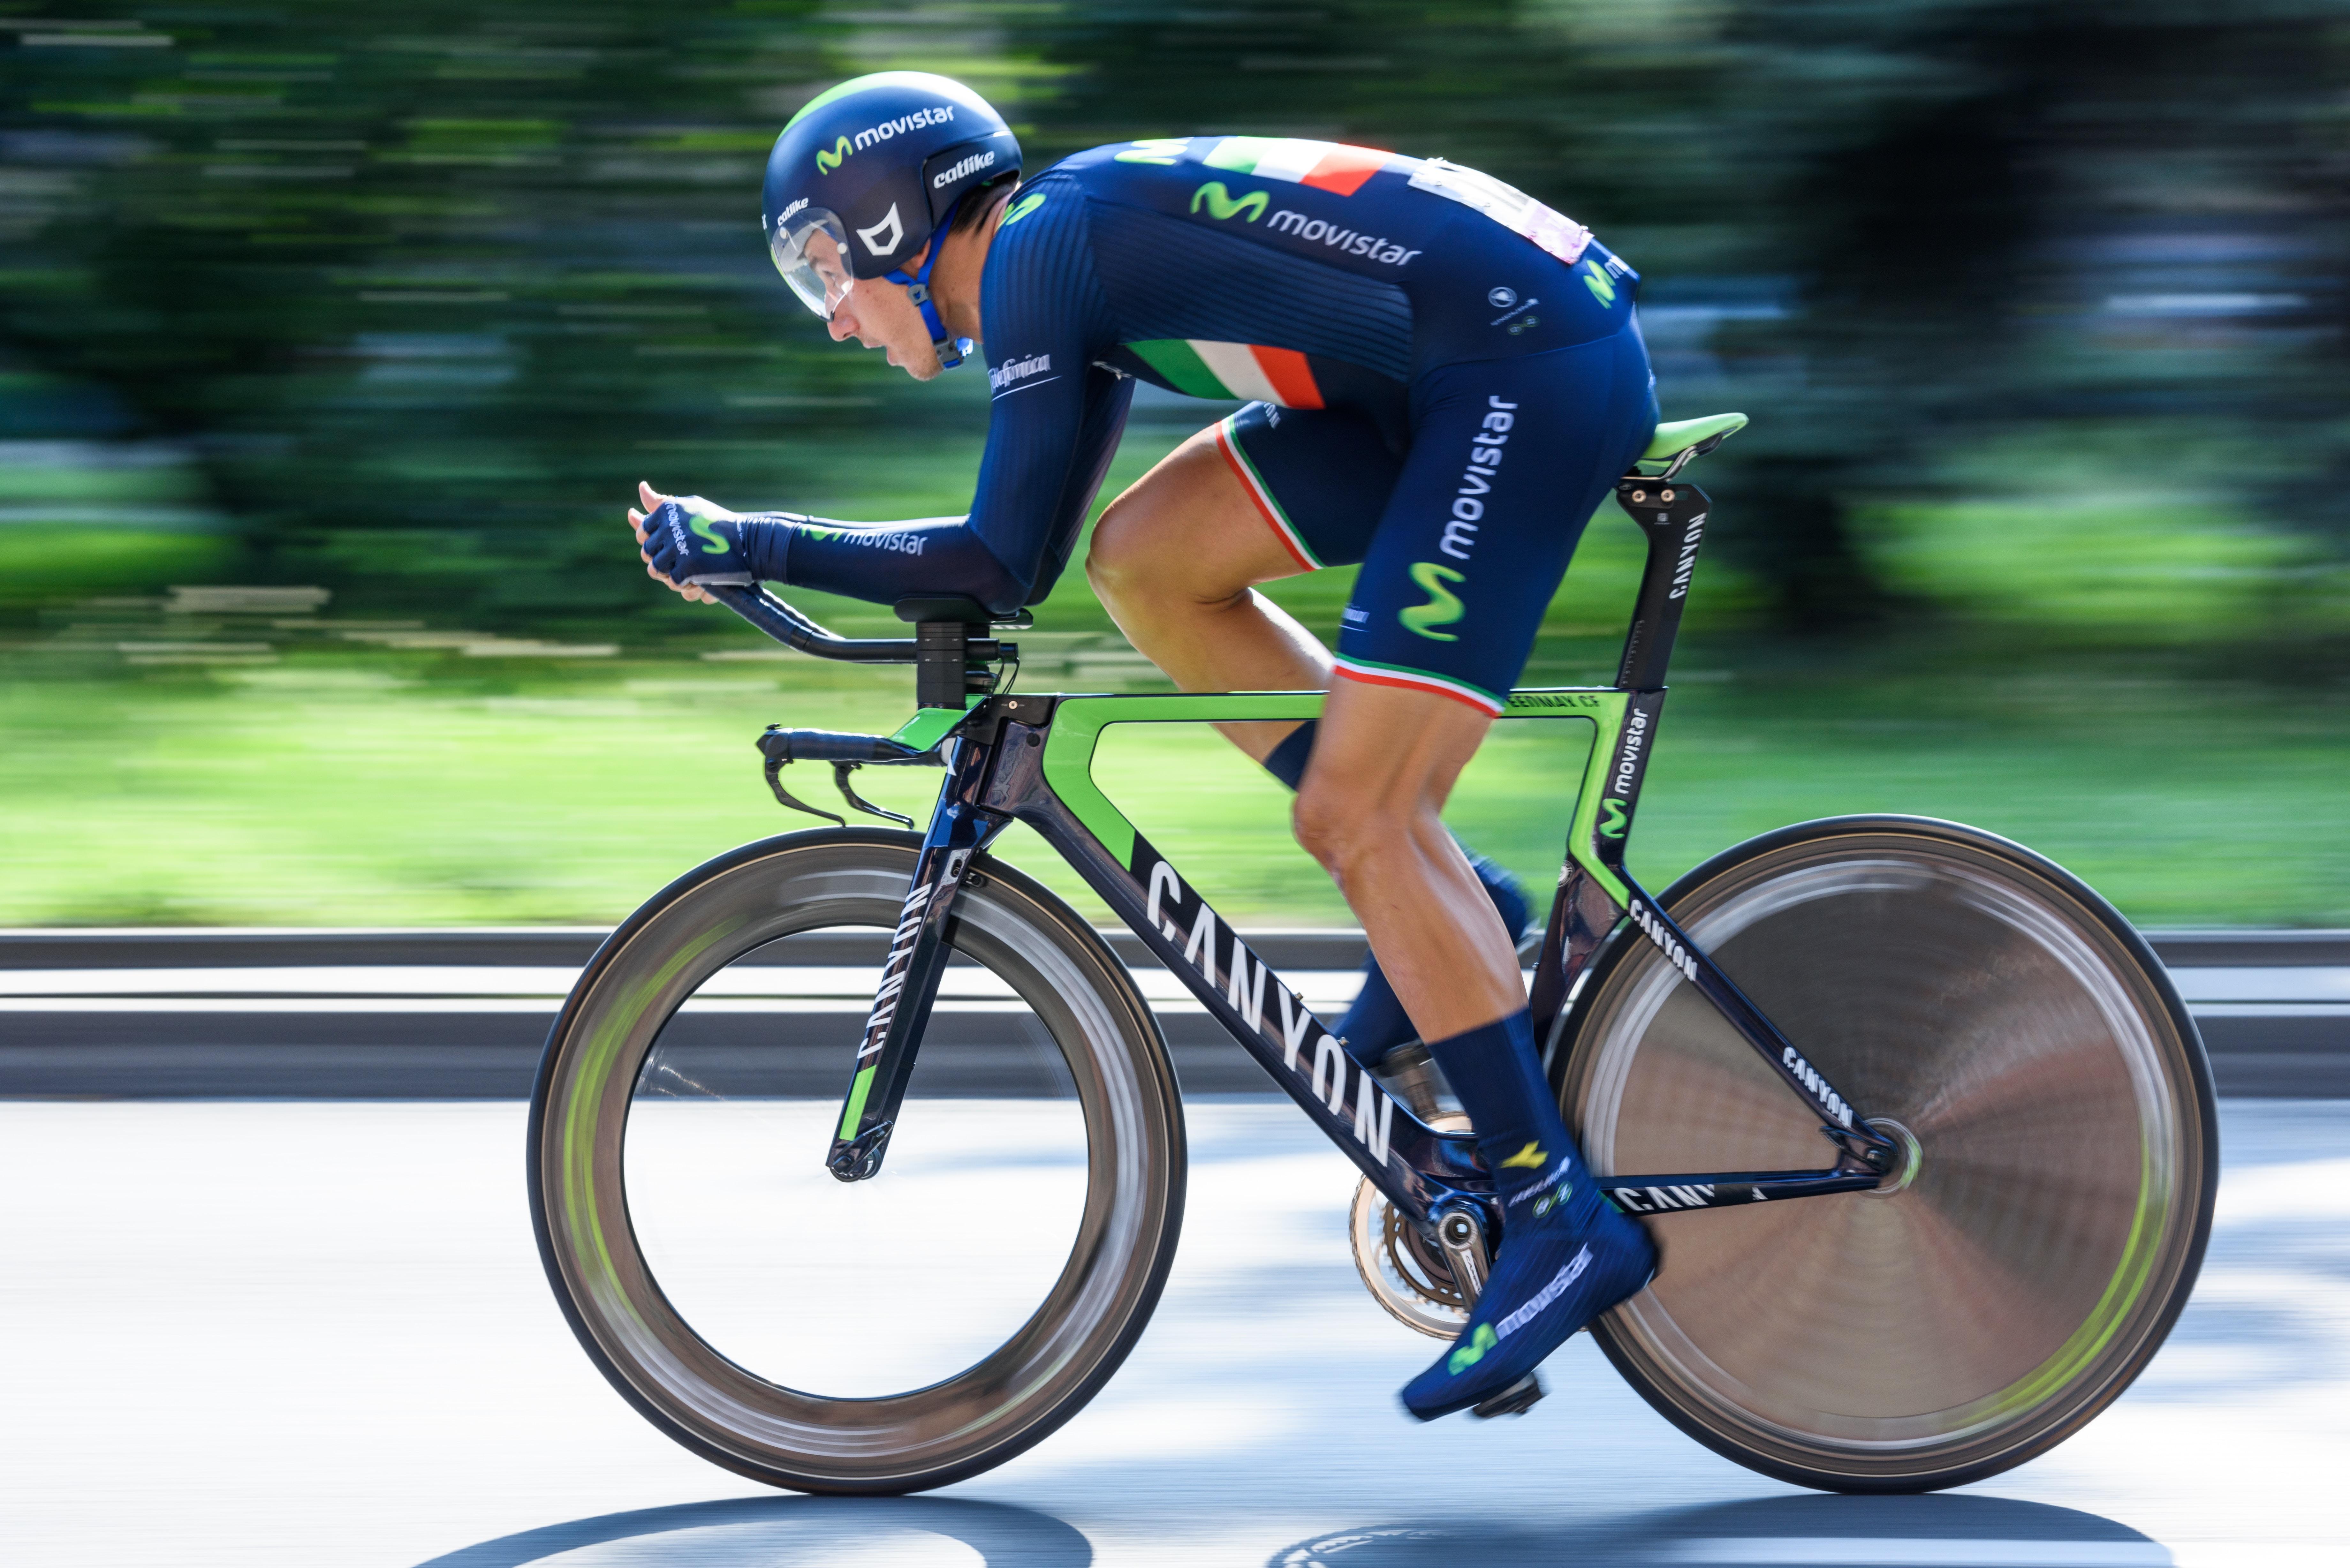 man in triathlon bike